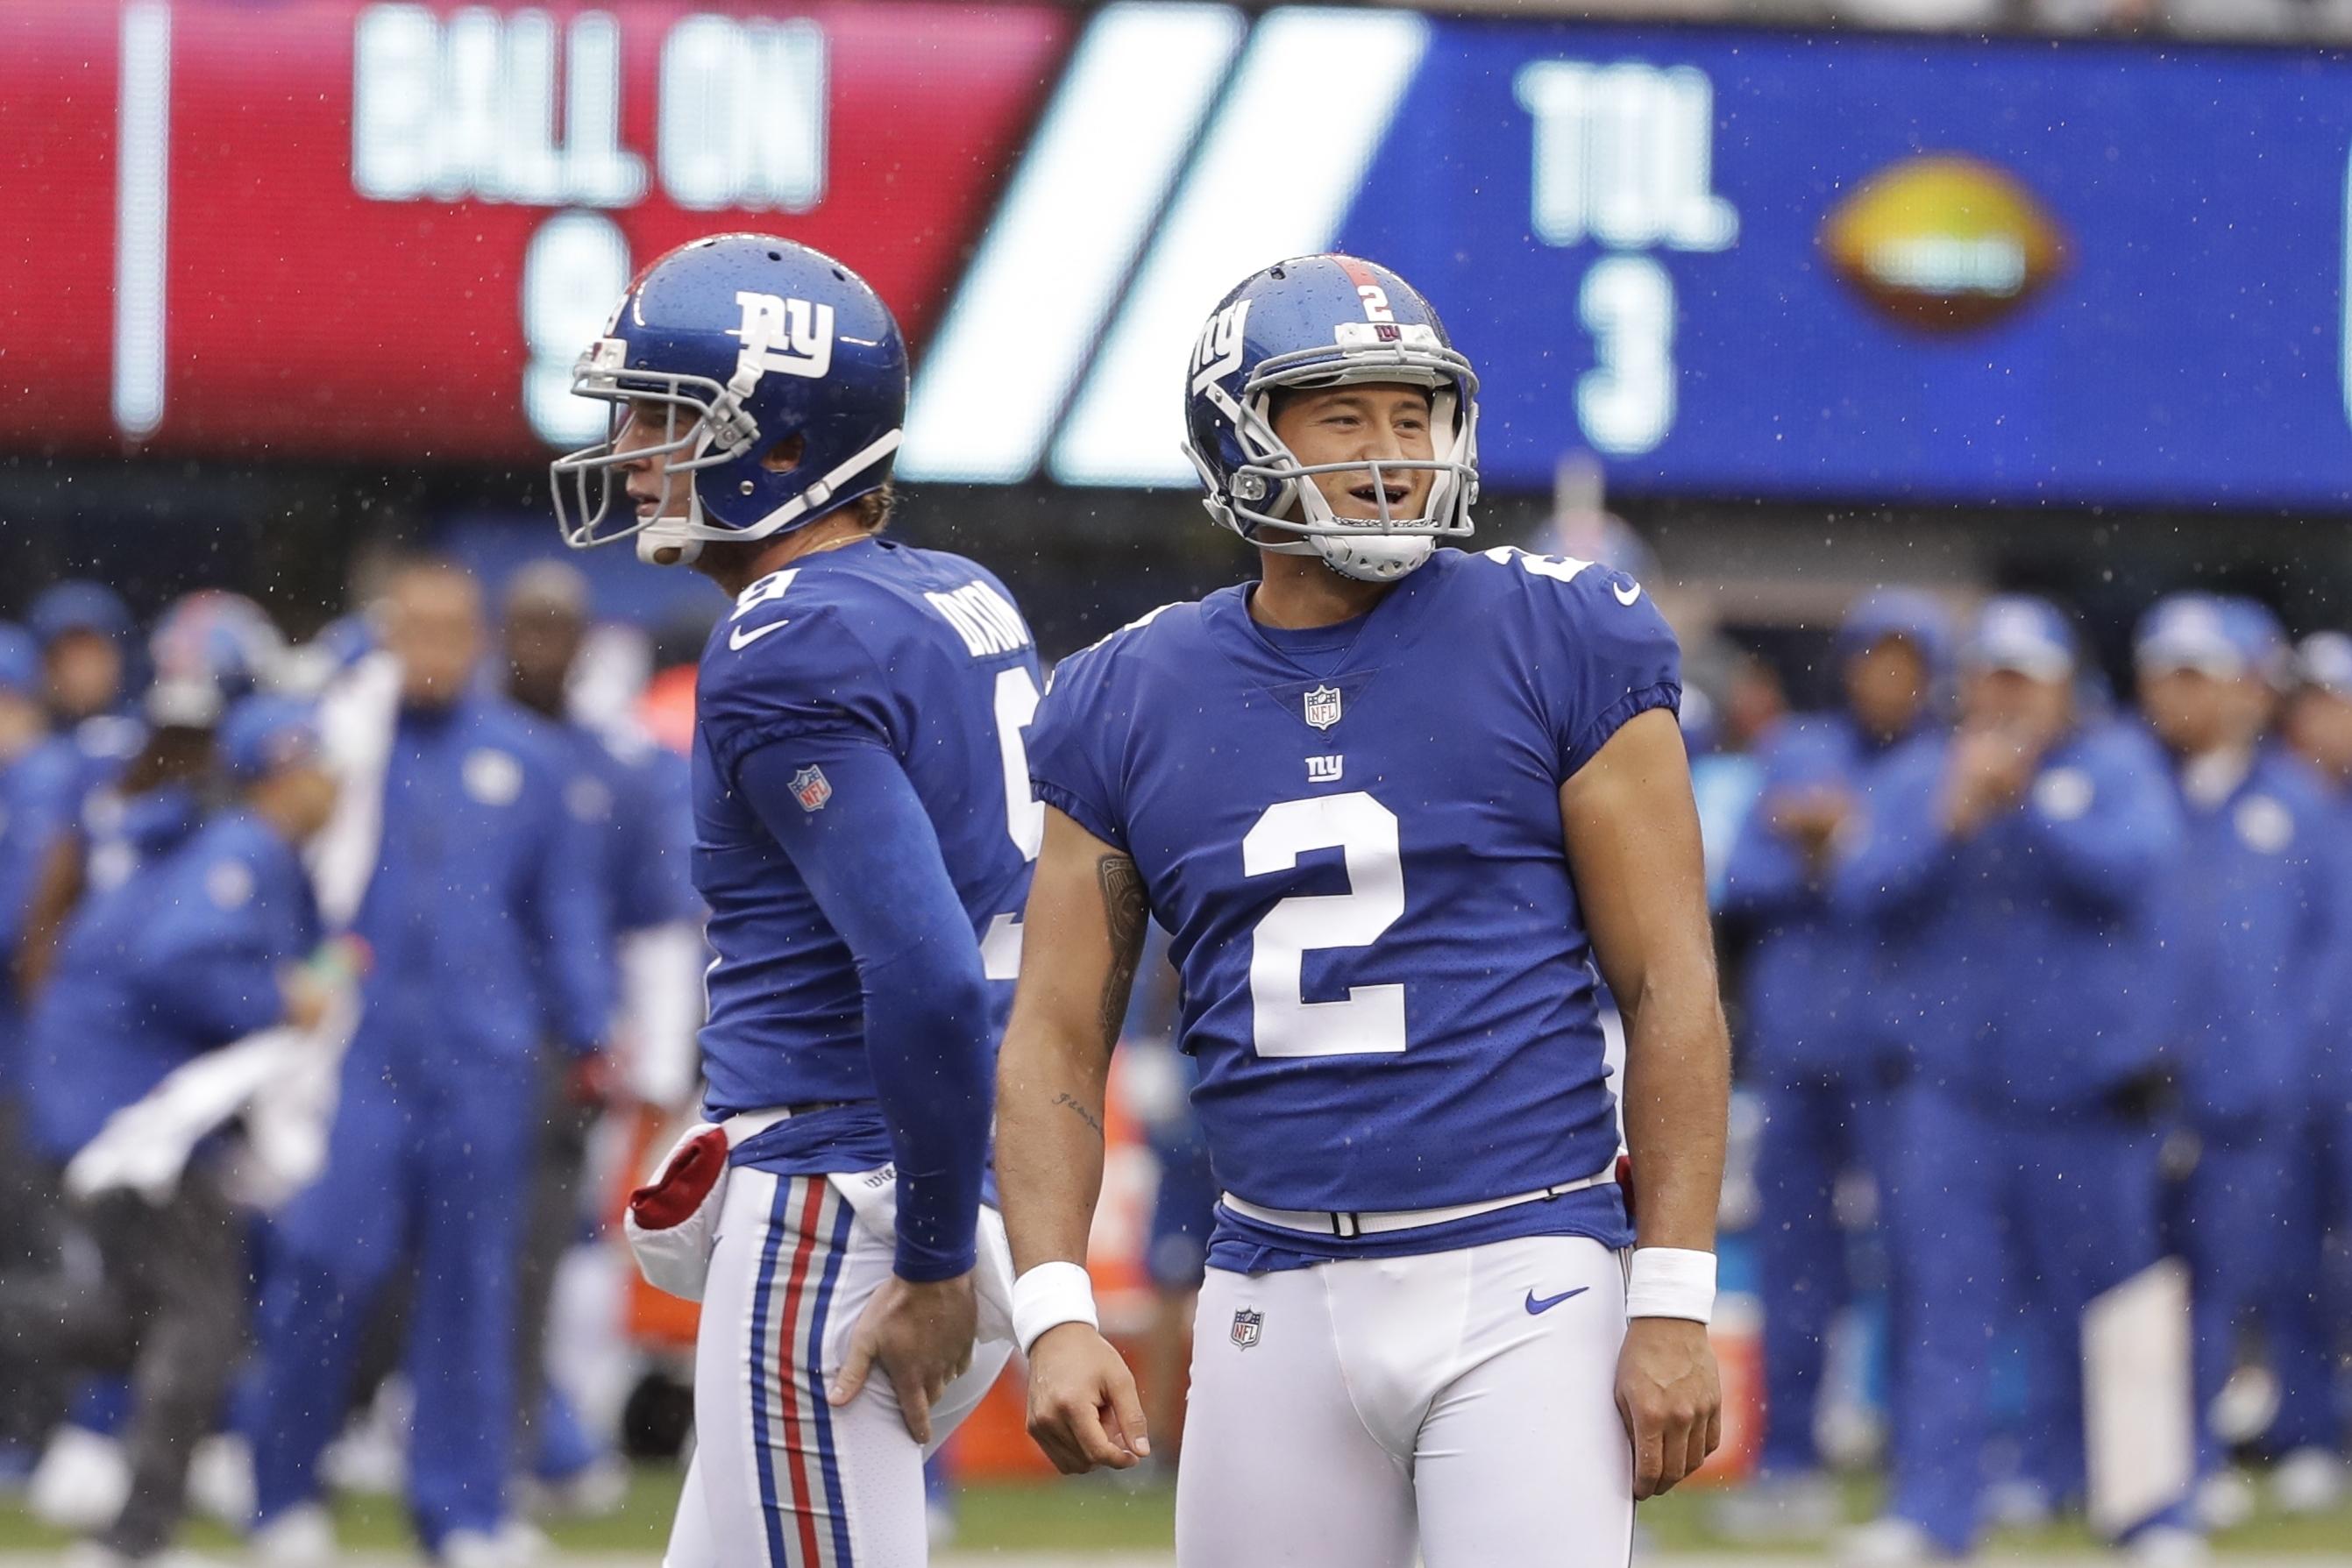 Aldrick Rosas New York Giants NFC Pro Bowl Game Jersey